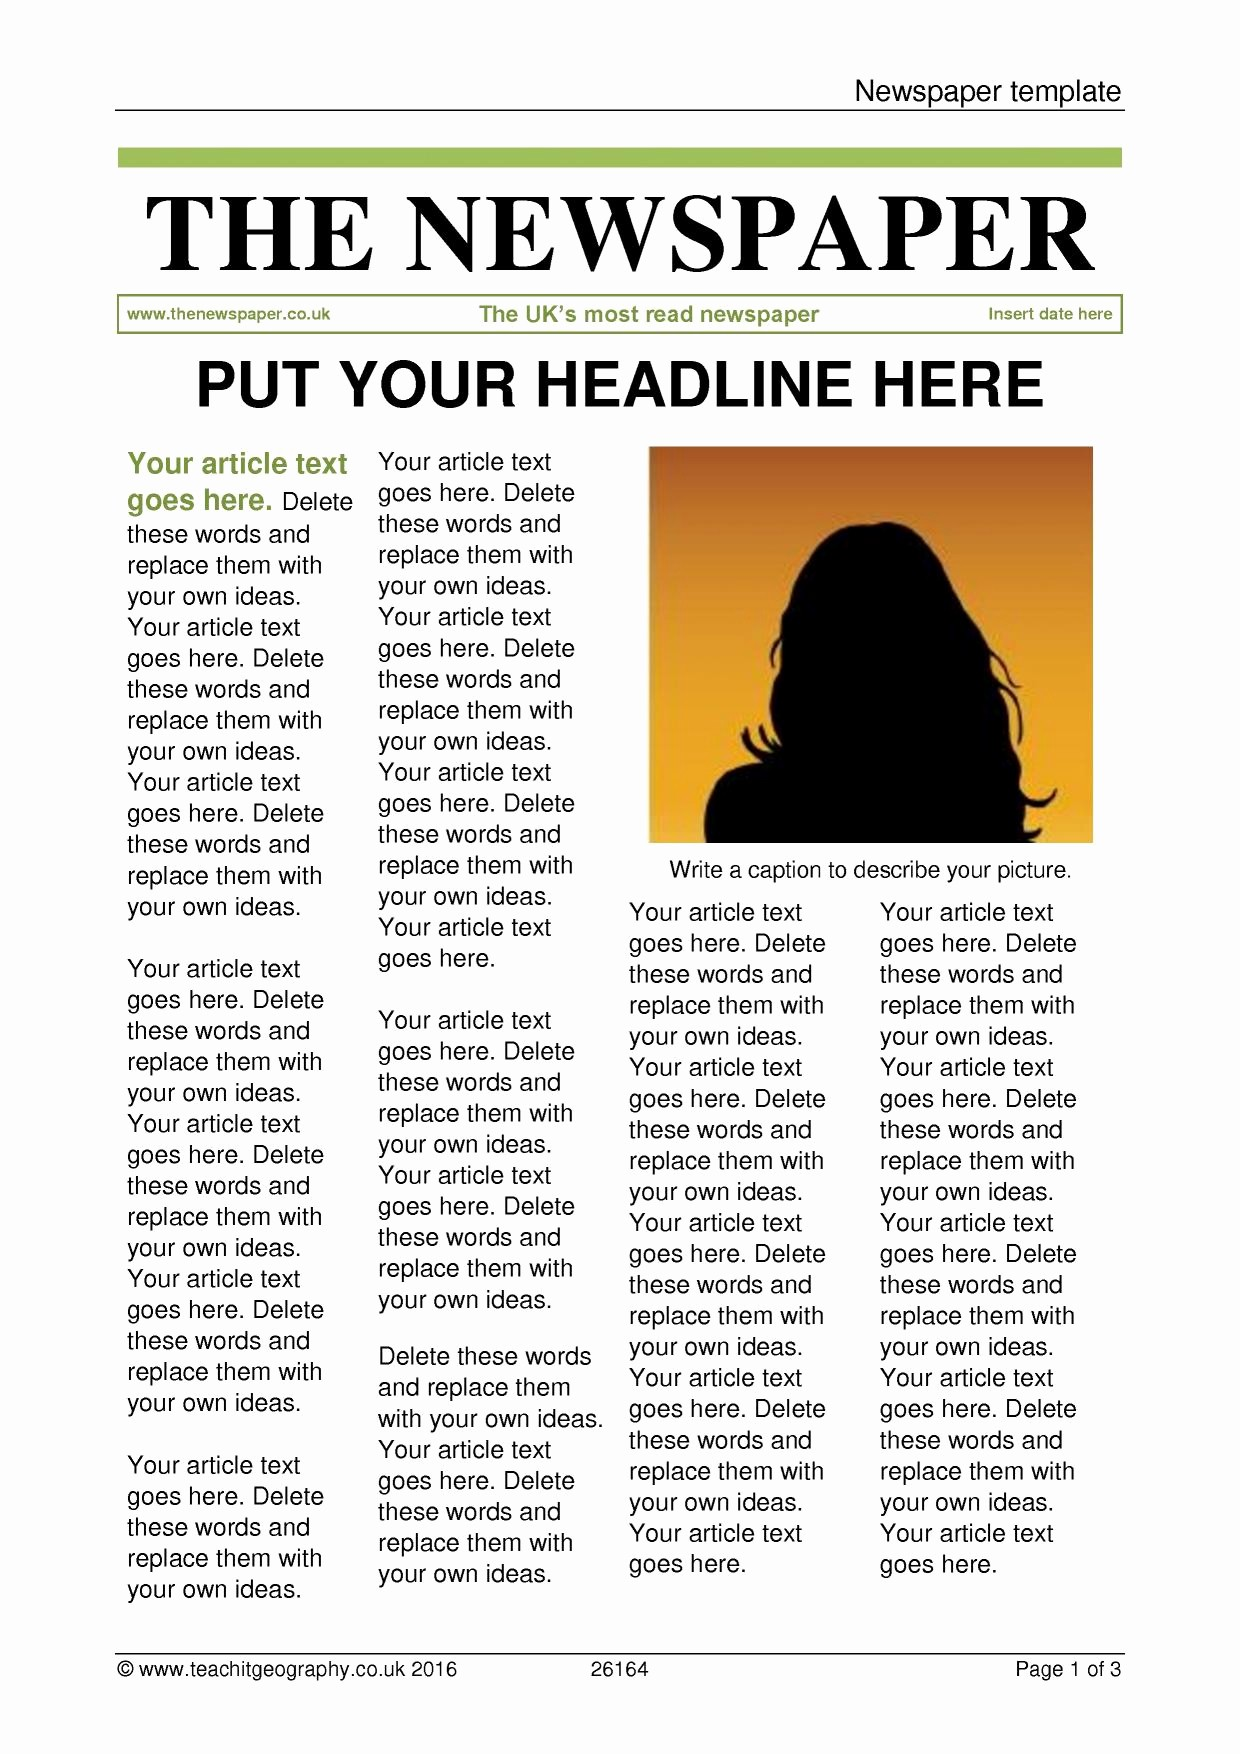 Microsoft Word Newspaper Article Template Beautiful Newspaper Template